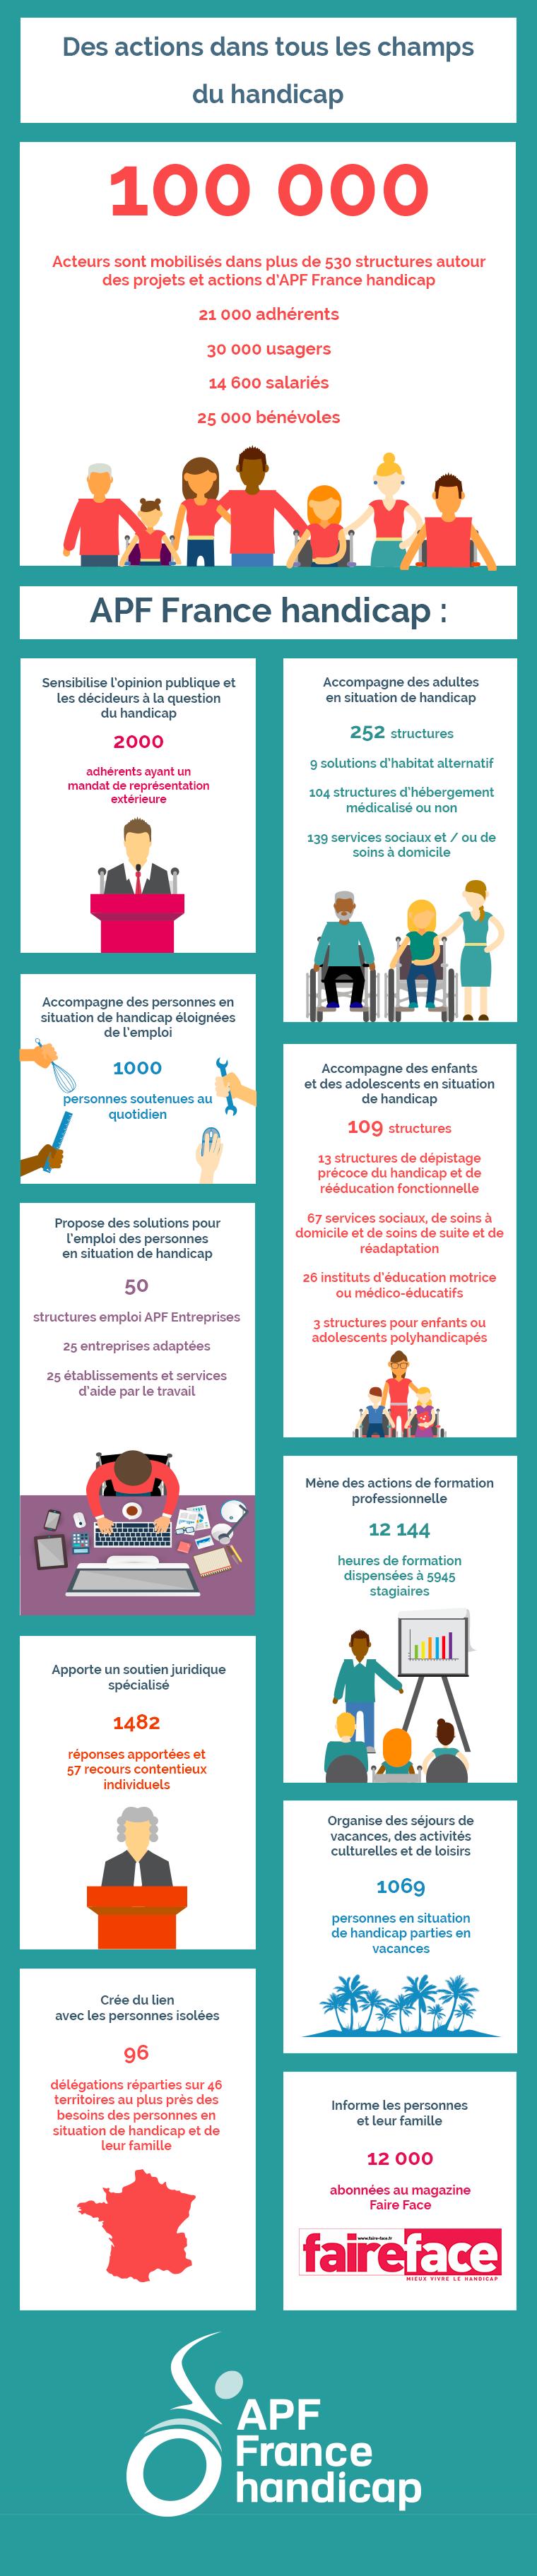 APF France handicap en chiffres